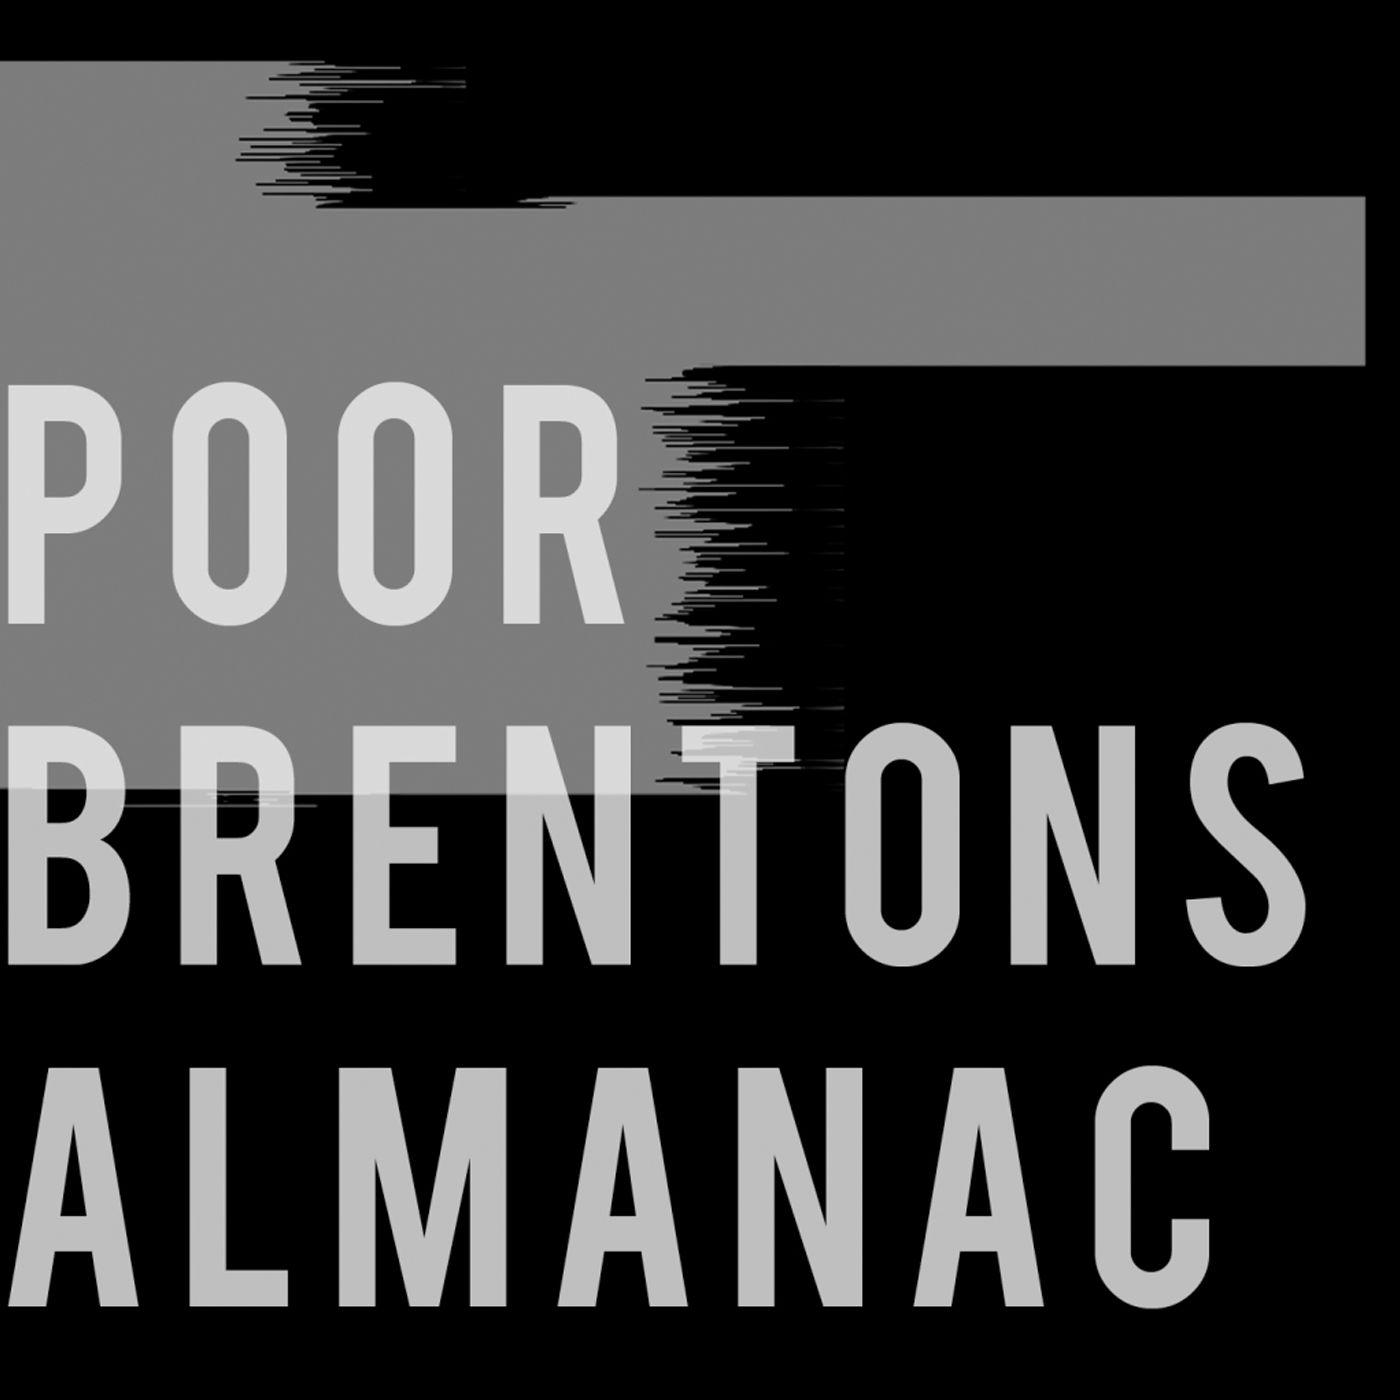 Poor Brentons Almanac